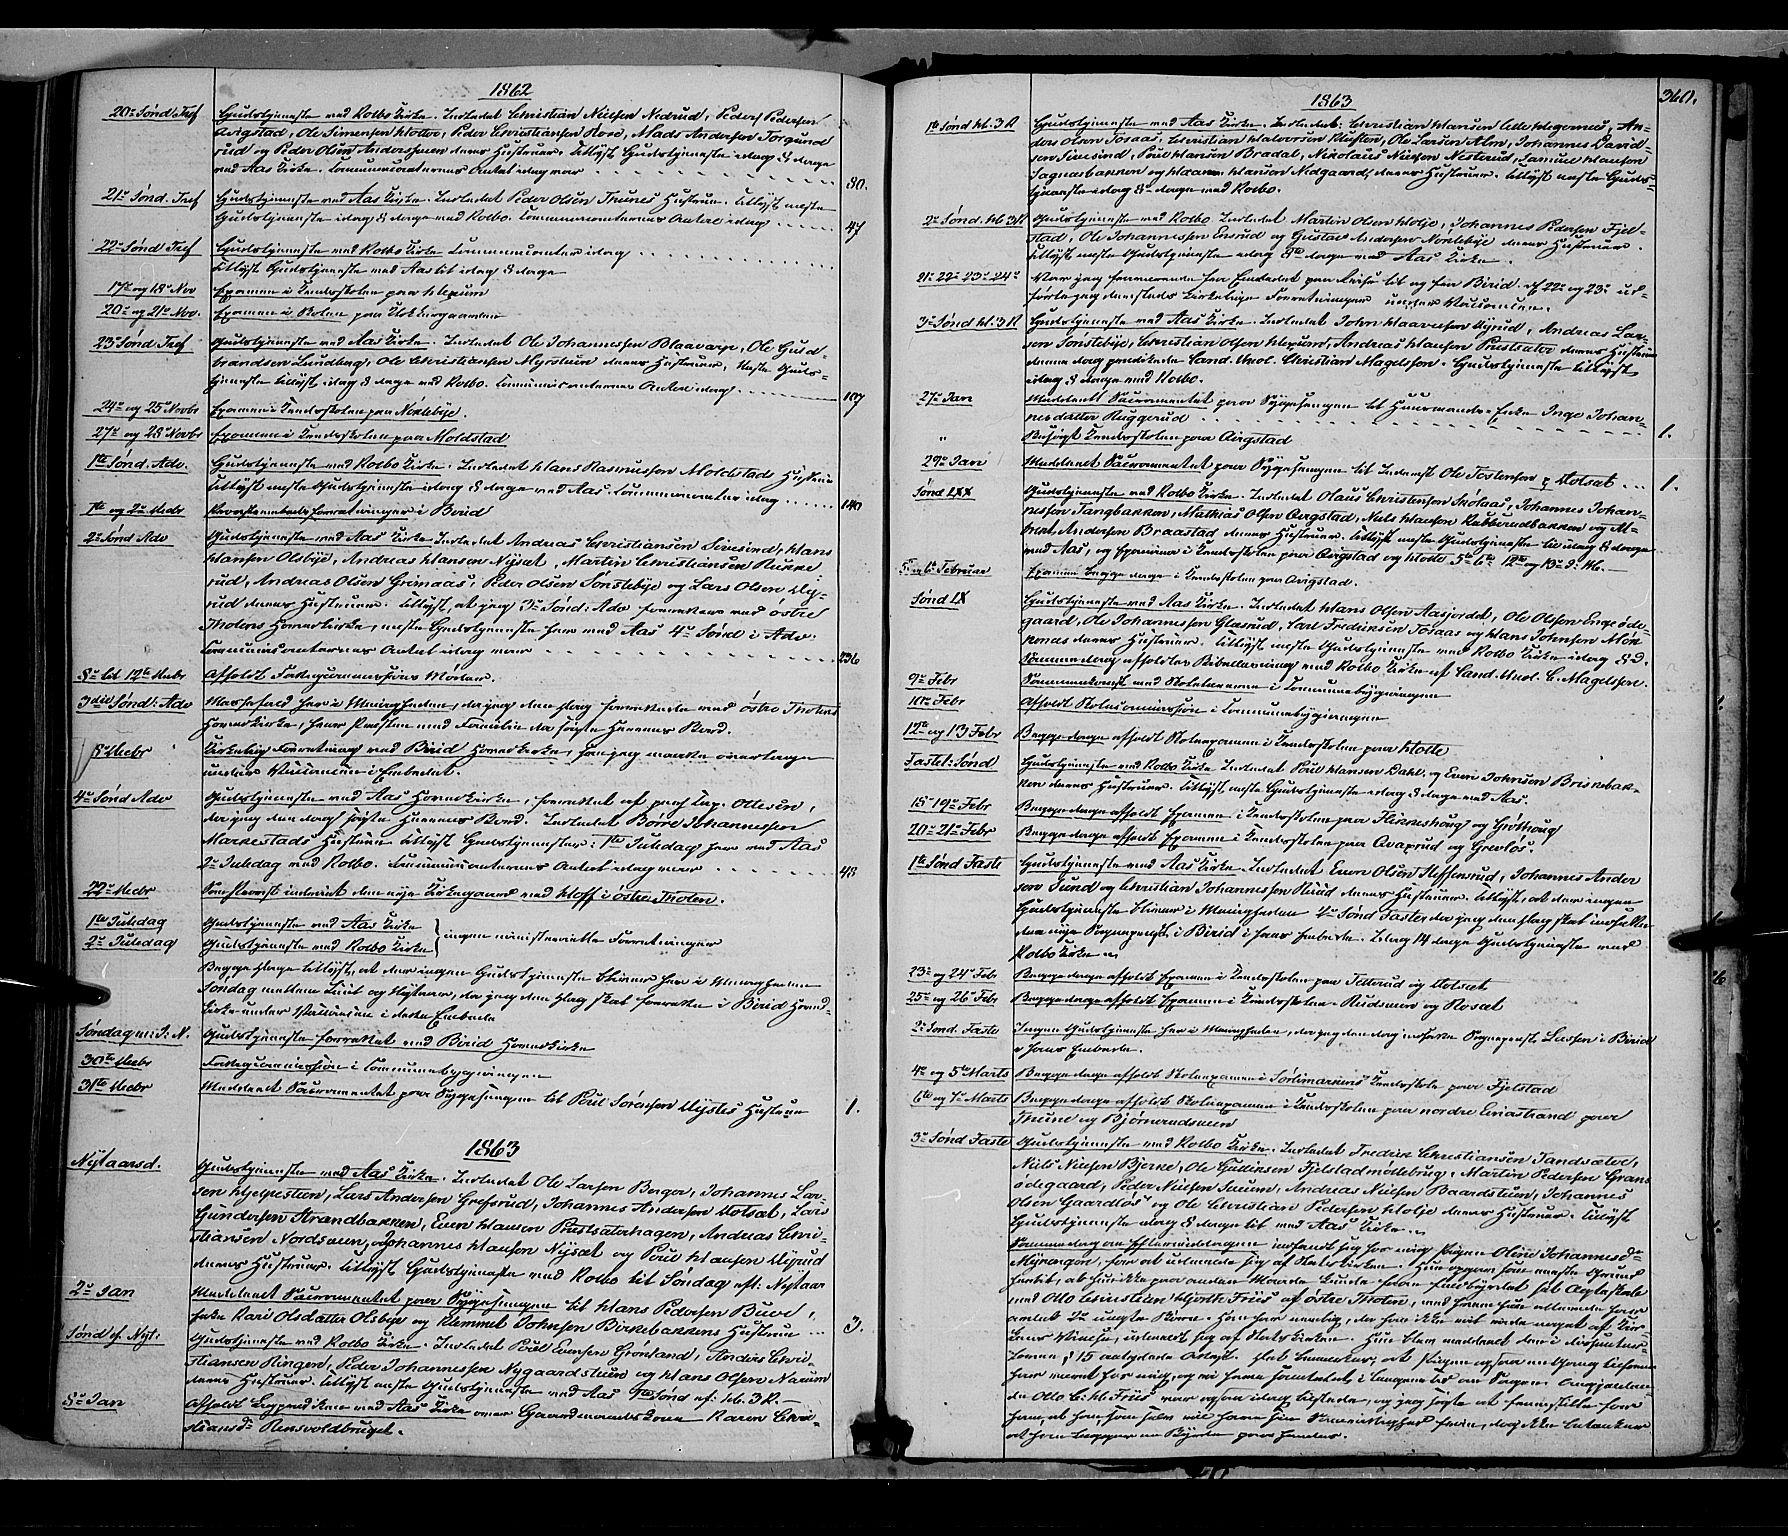 SAH, Vestre Toten prestekontor, H/Ha/Haa/L0007: Ministerialbok nr. 7, 1862-1869, s. 360